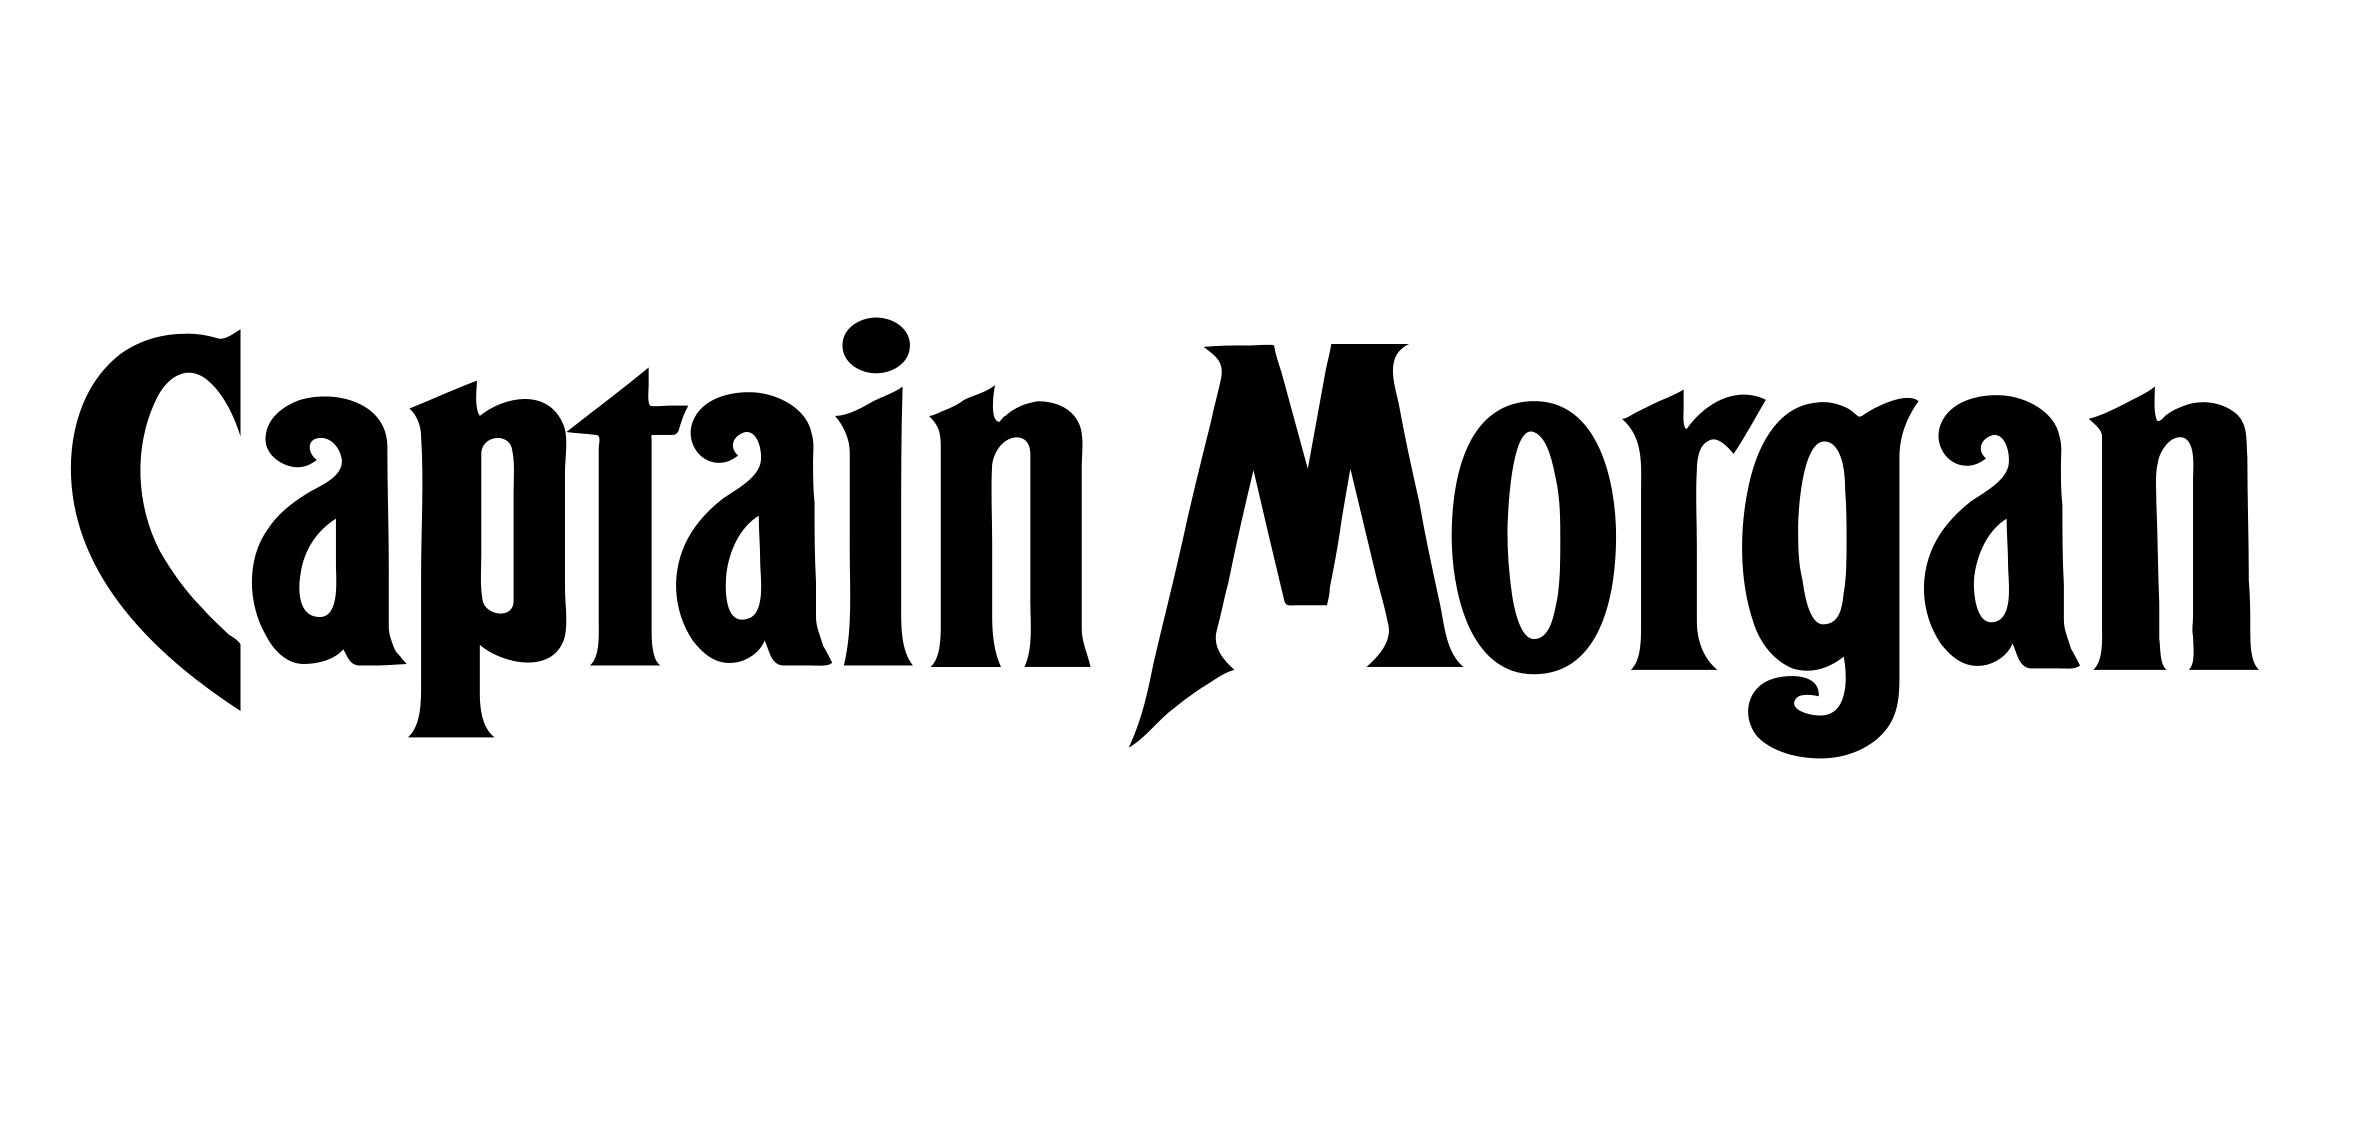 captain-morgan-1-logo-black-and-white.png